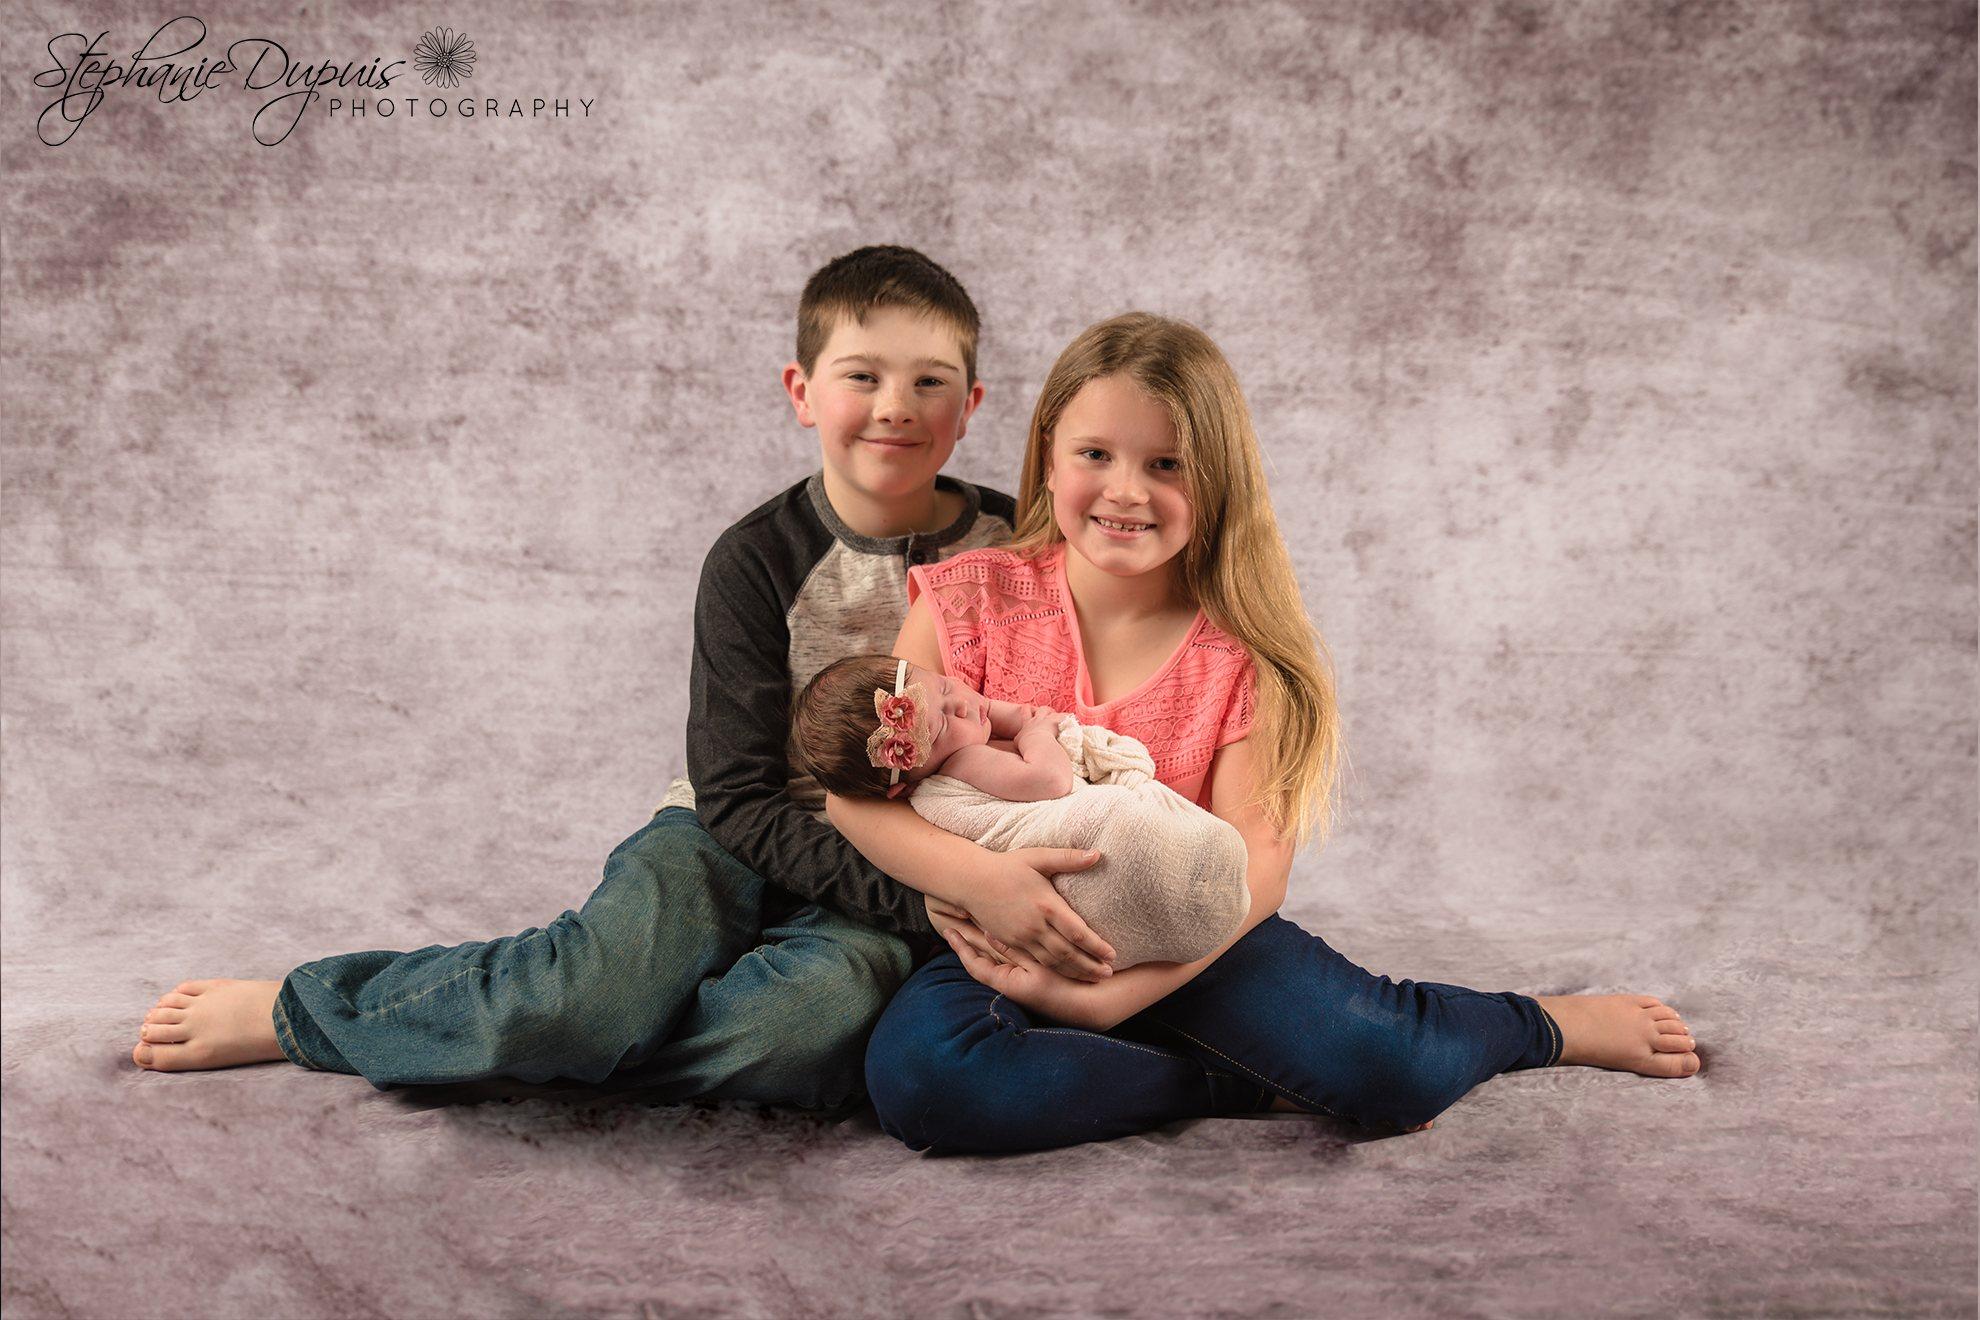 Trisha Eckherdt Infant 1006 - Portfolio: Rayia - Infant Session